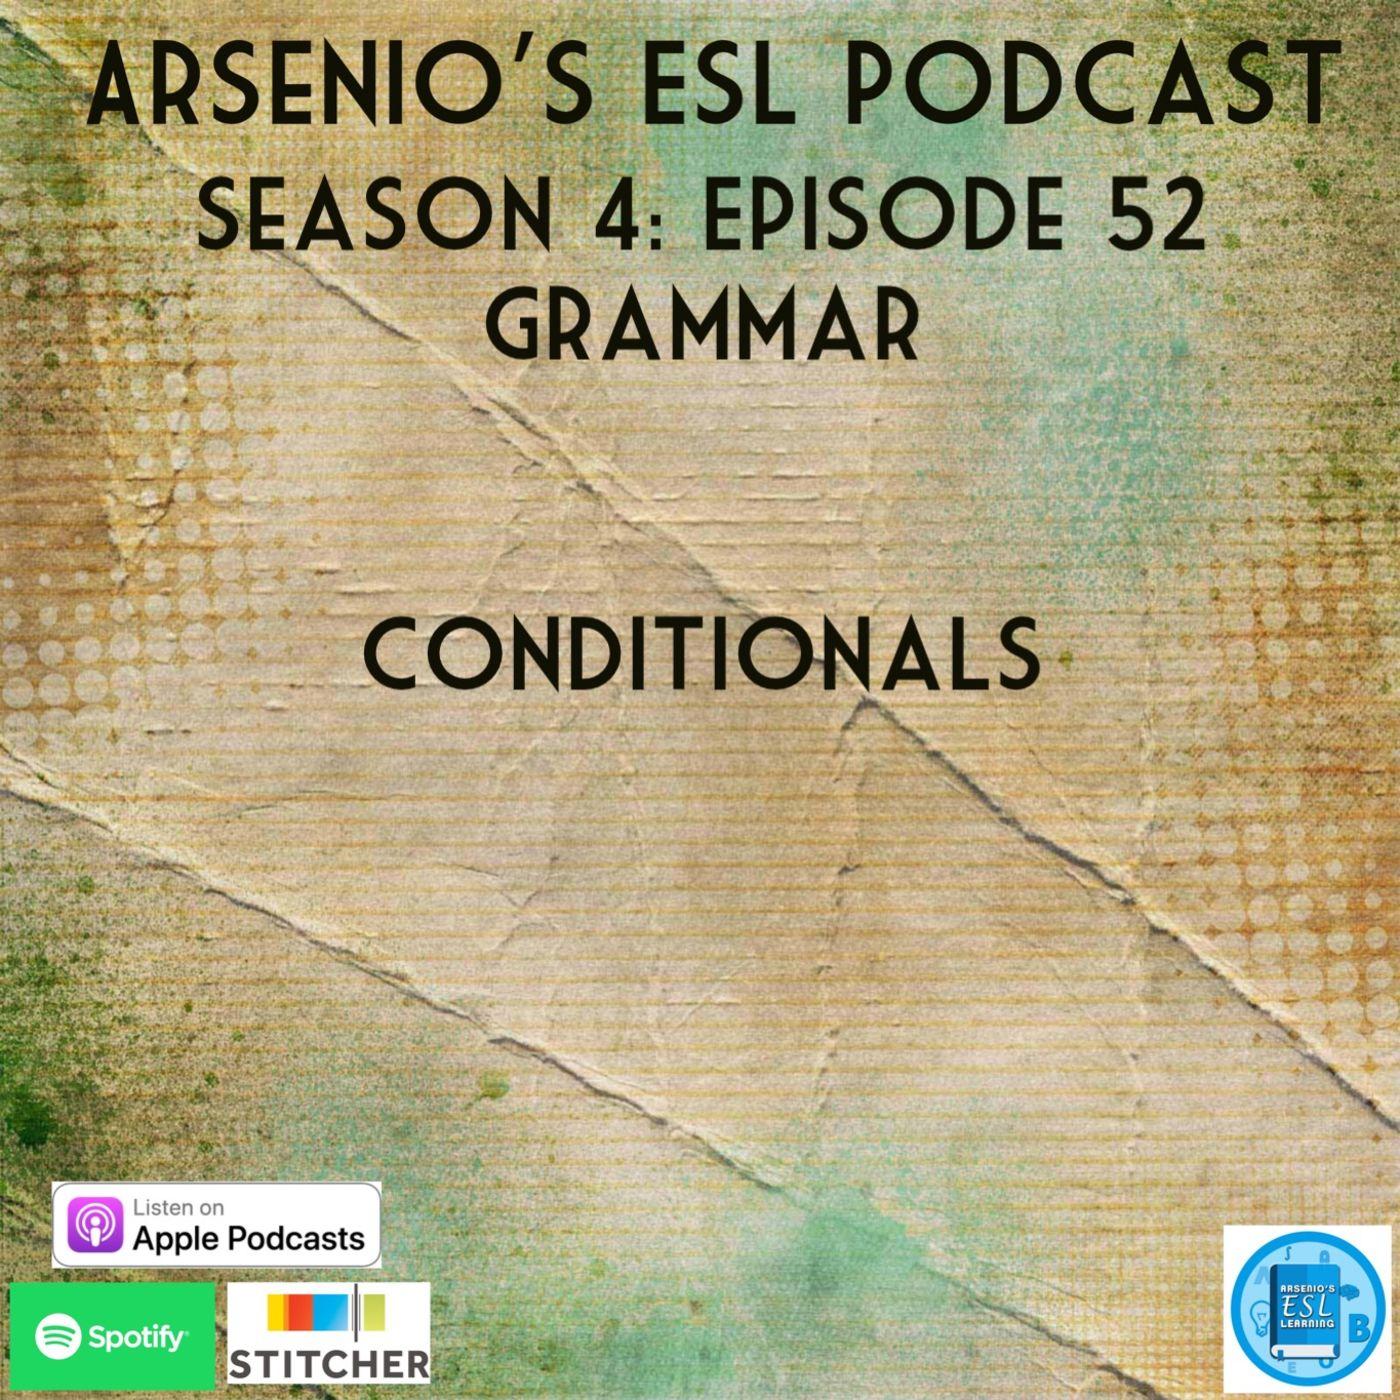 Arsenio's ESL Podcast: Season 4 - Episode 52 - Grammar - Conditionals